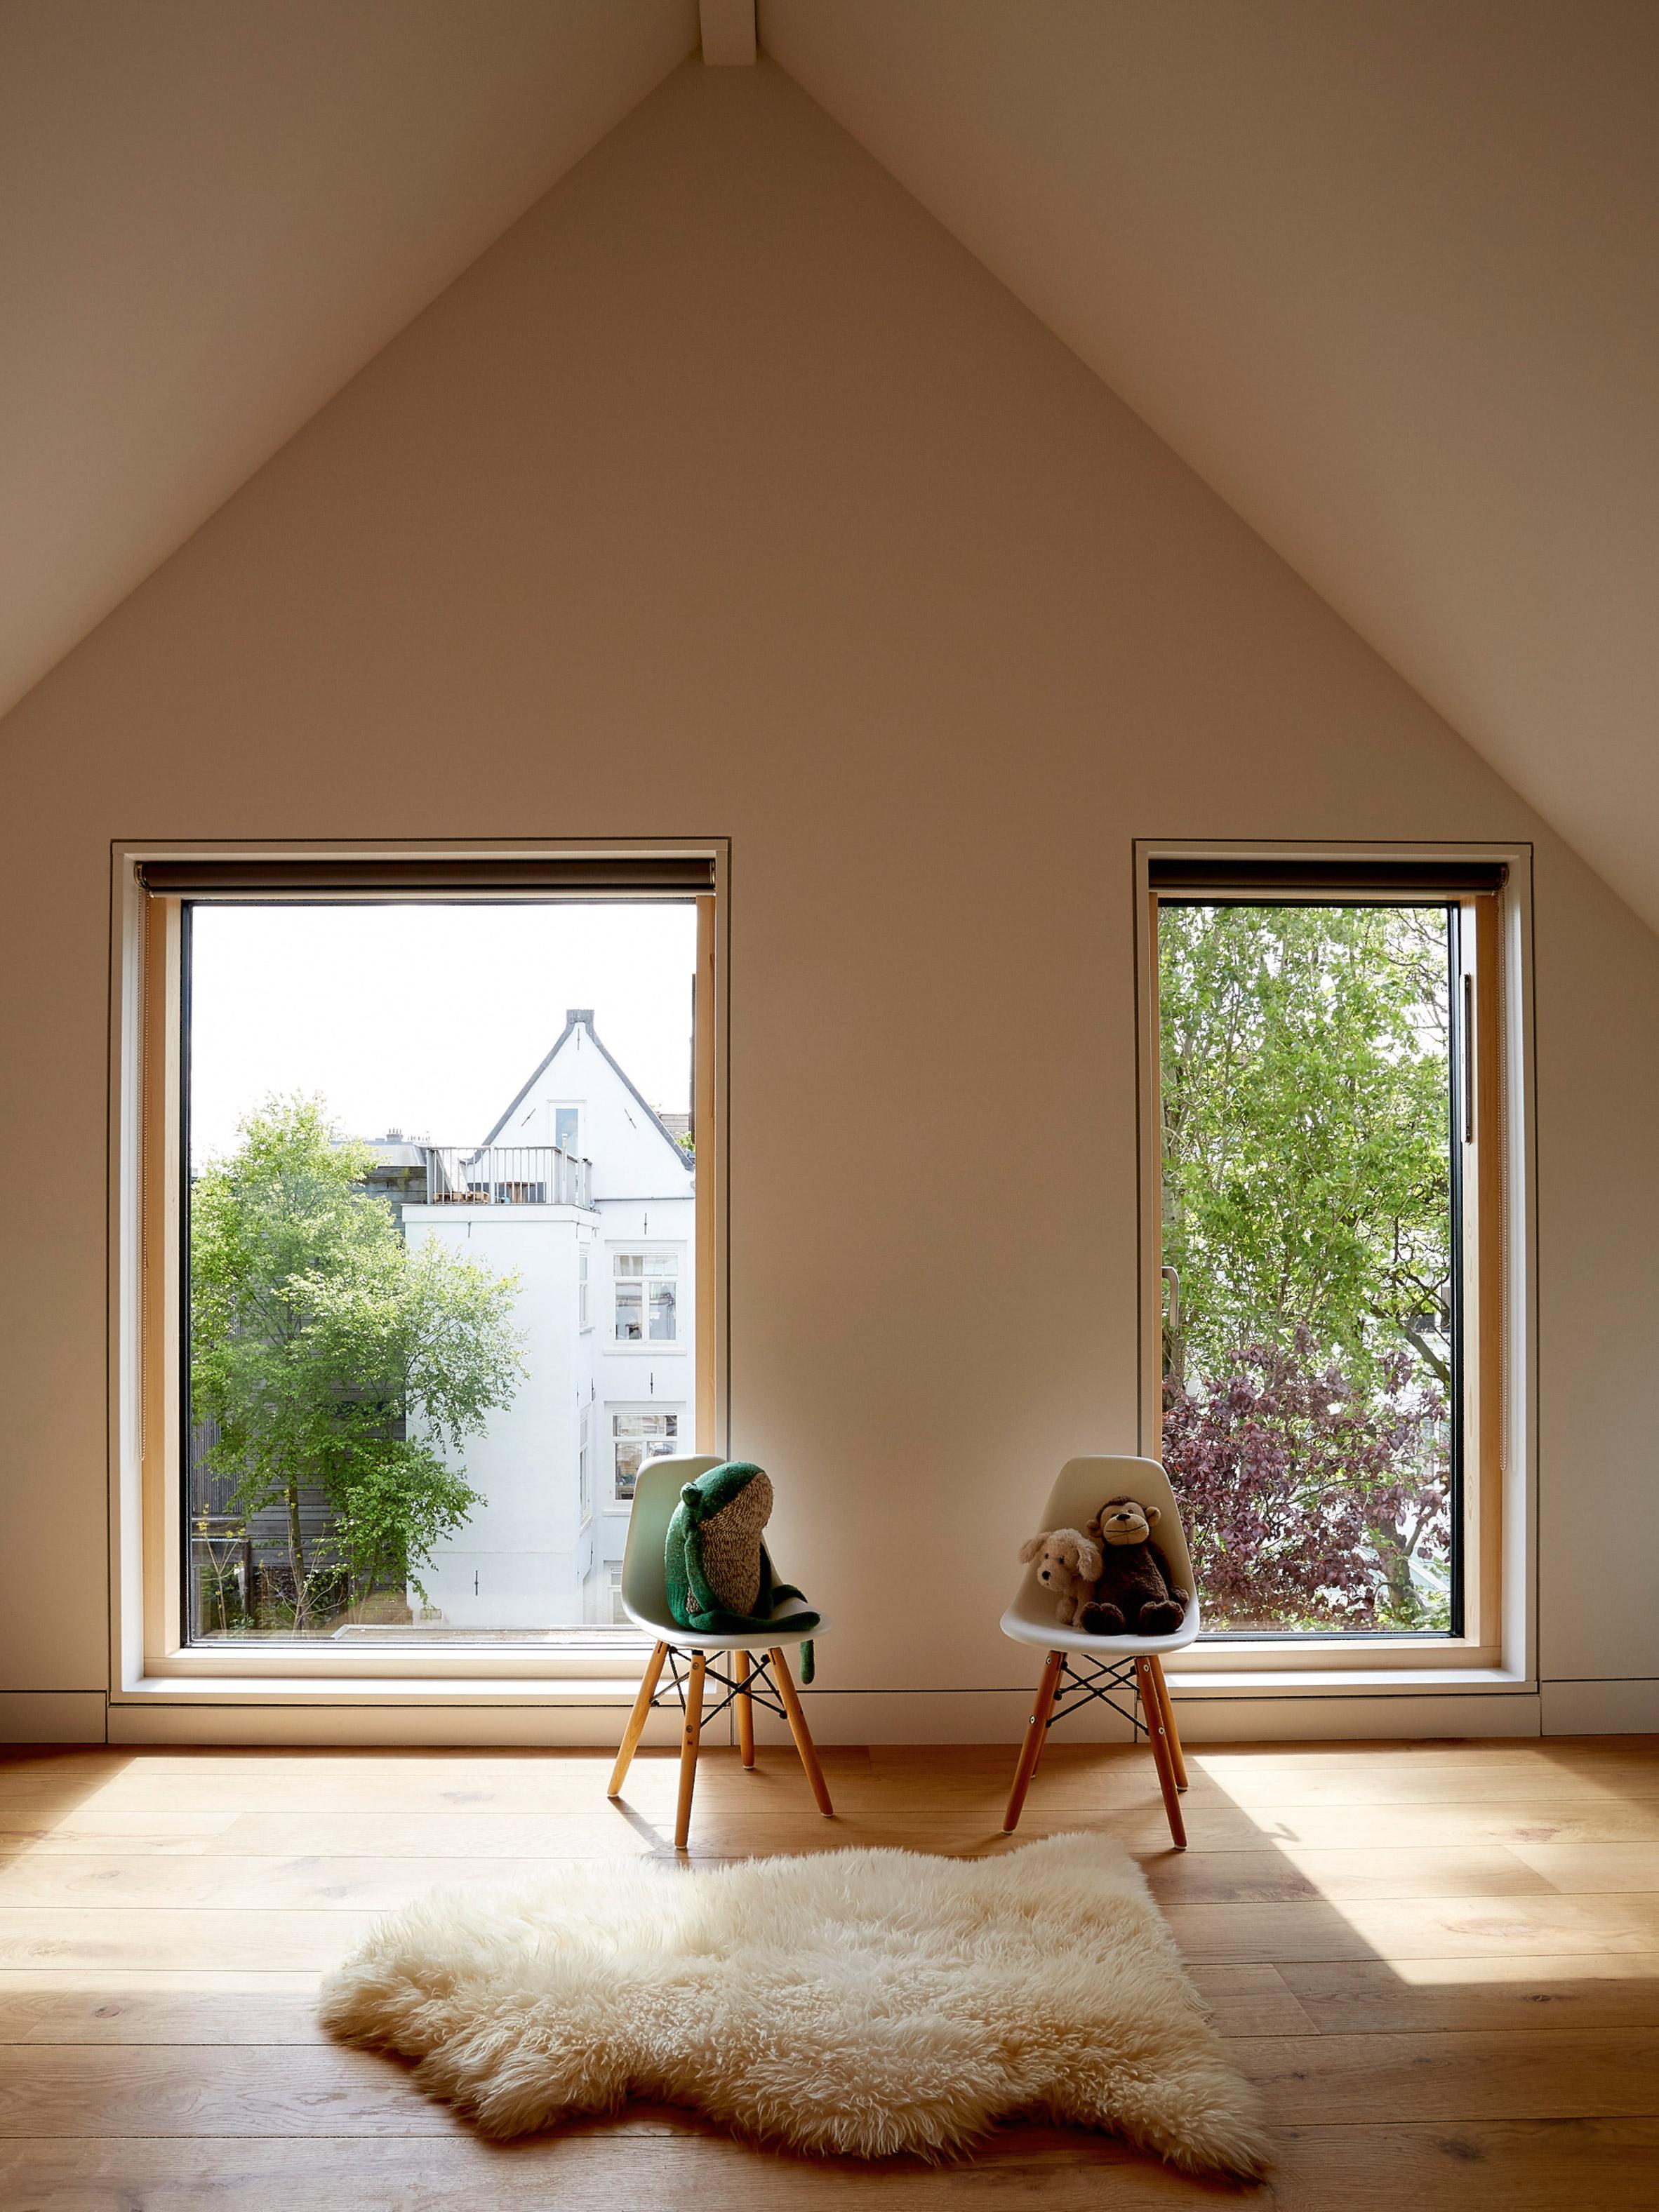 wenslauer-house-31-44-amsterdam-architecture-residential_dezeen_2364_col_13